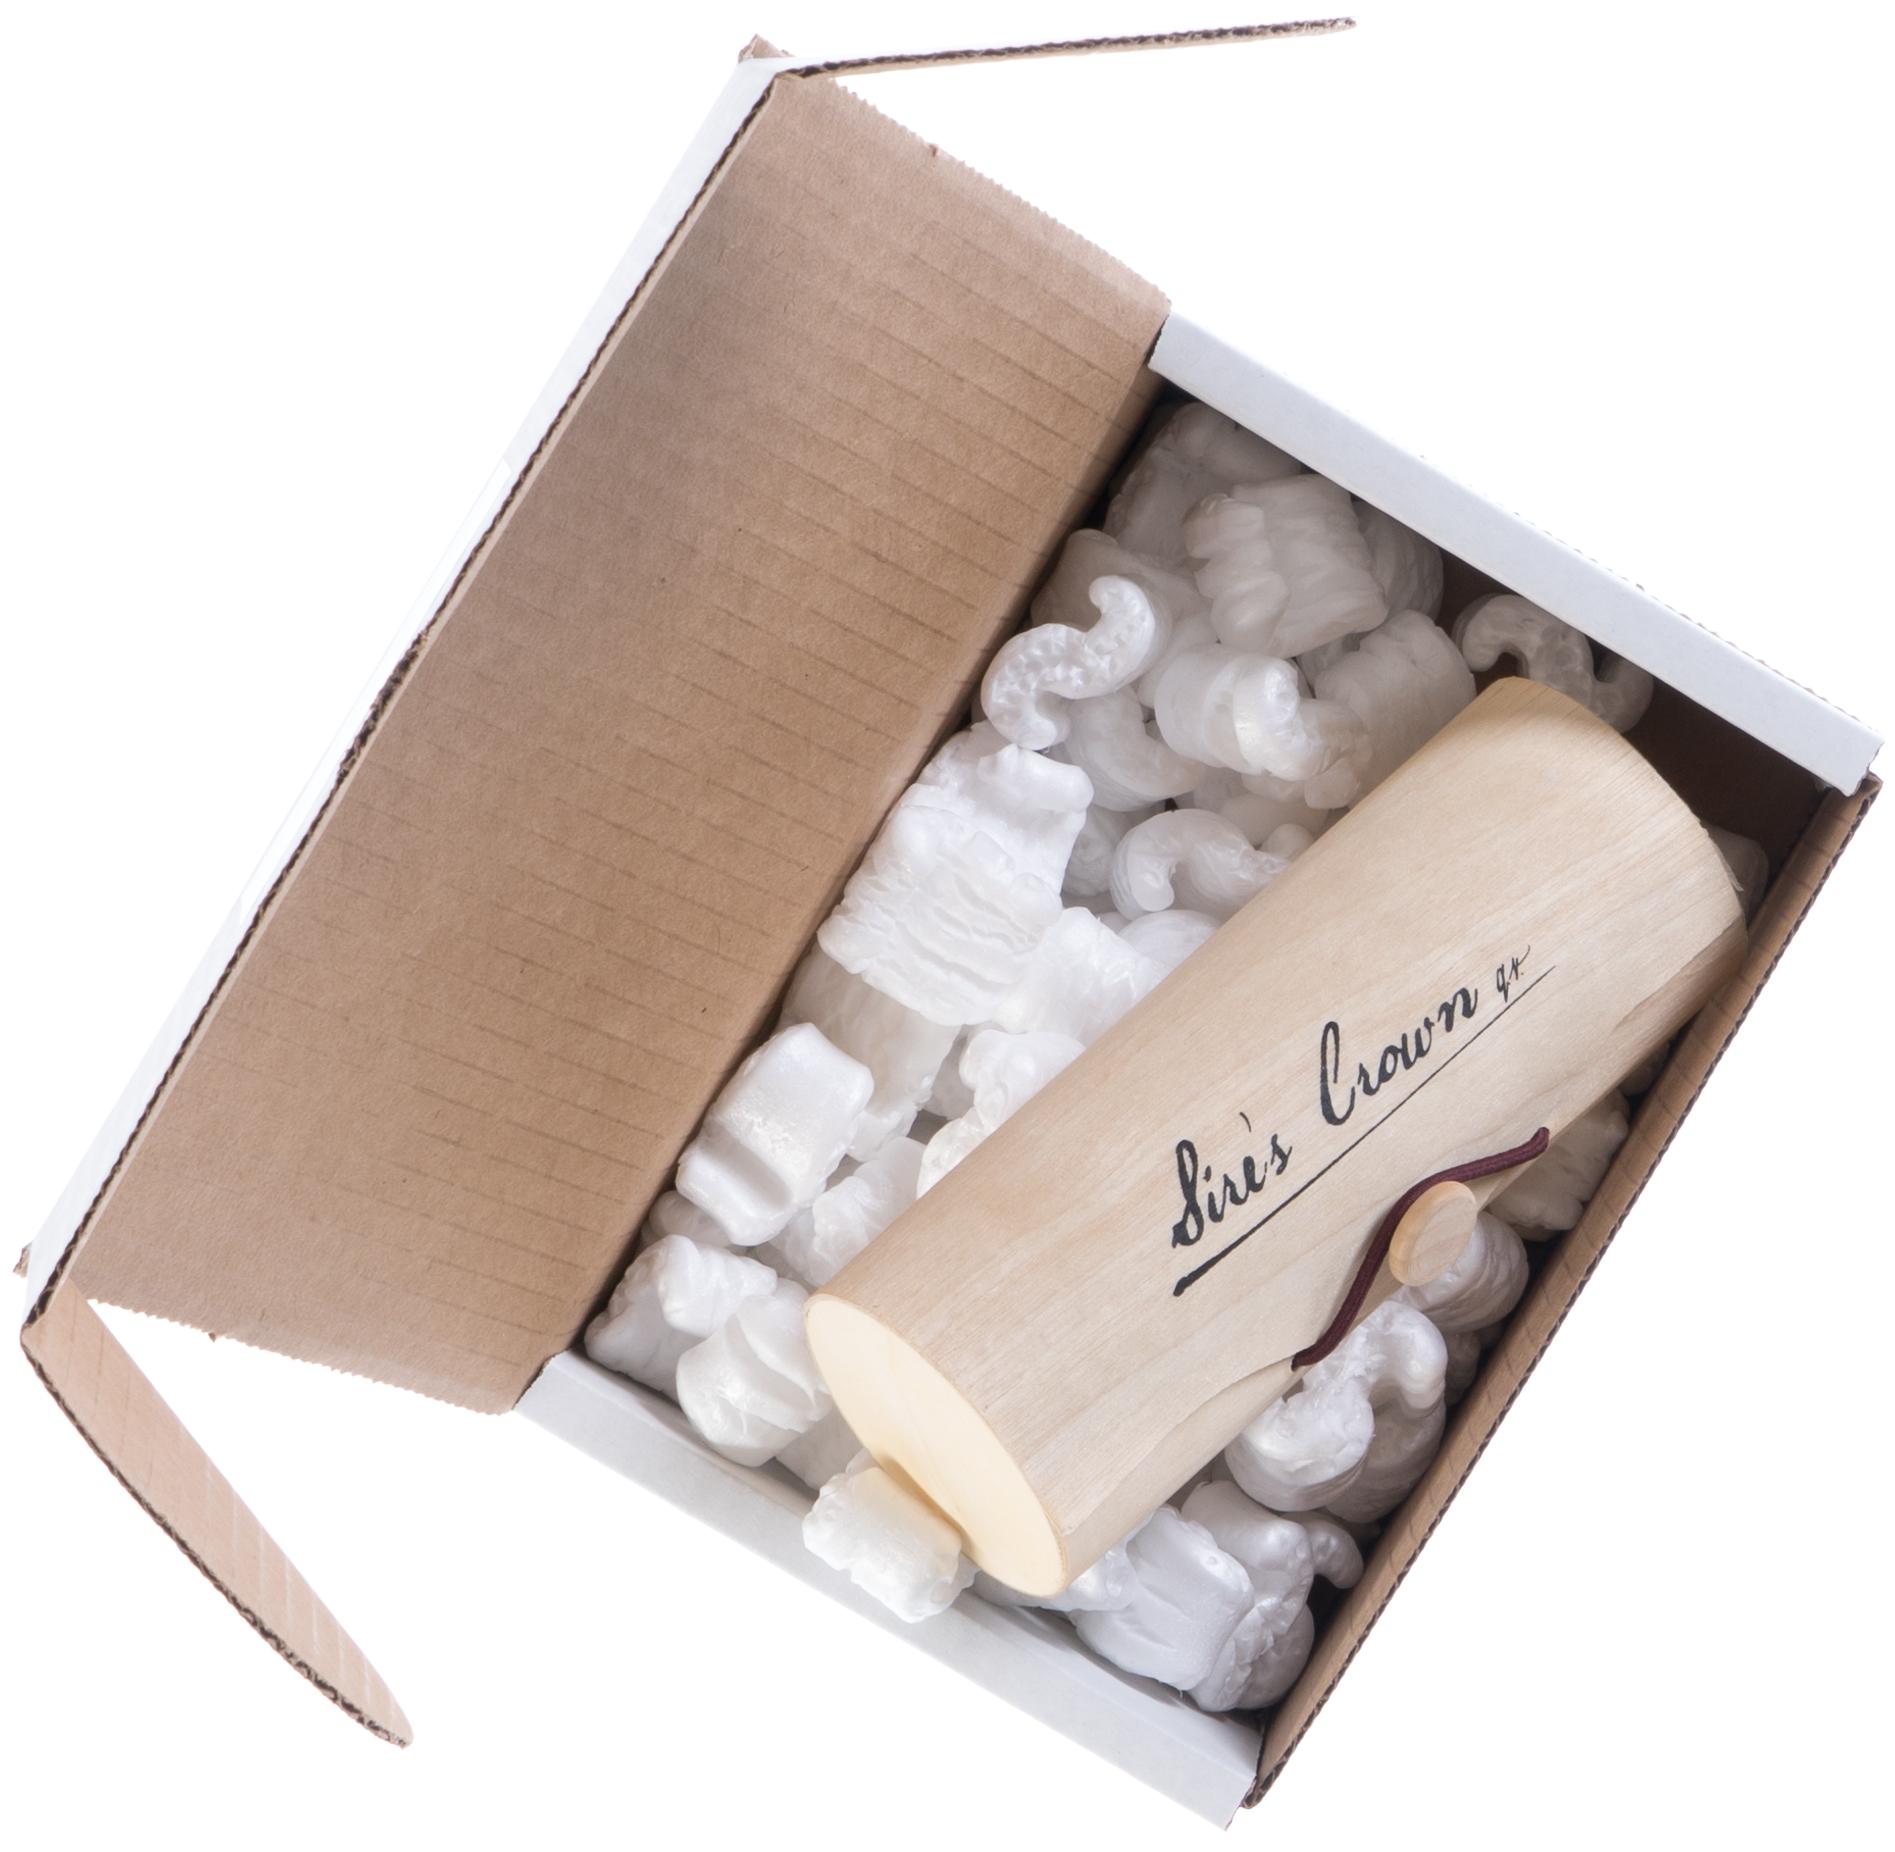 Shipping box of Sires Eyewear